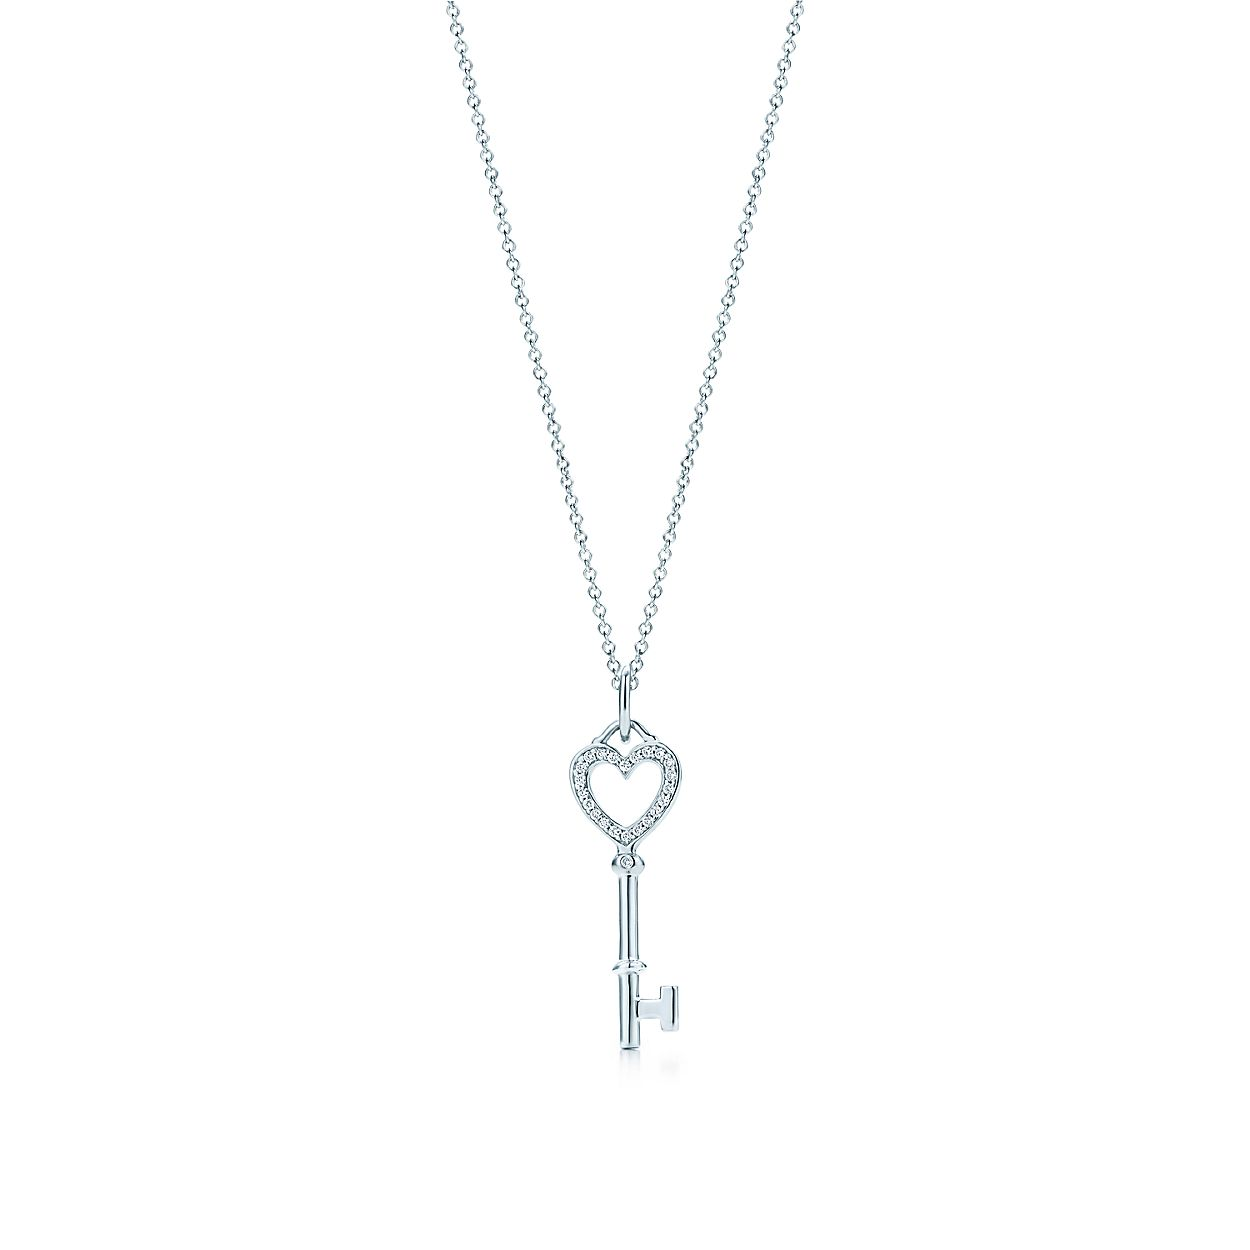 6a225e166111b Tiffany Keys heart key charm with diamonds in 18k white gold on a ...